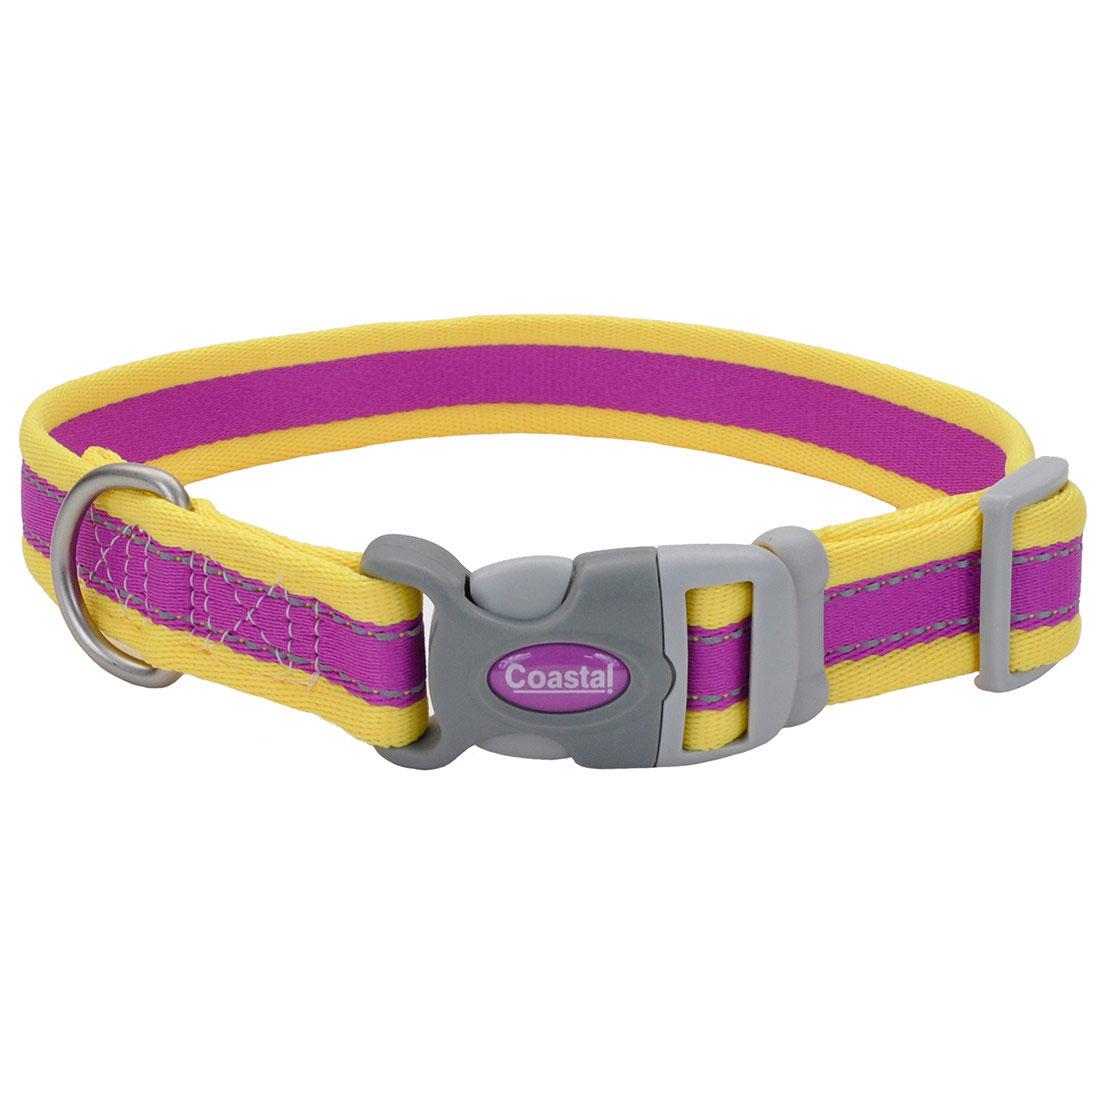 Coastal Pro Reflective Adjustable Dog Collar, Purple/Yellow Image